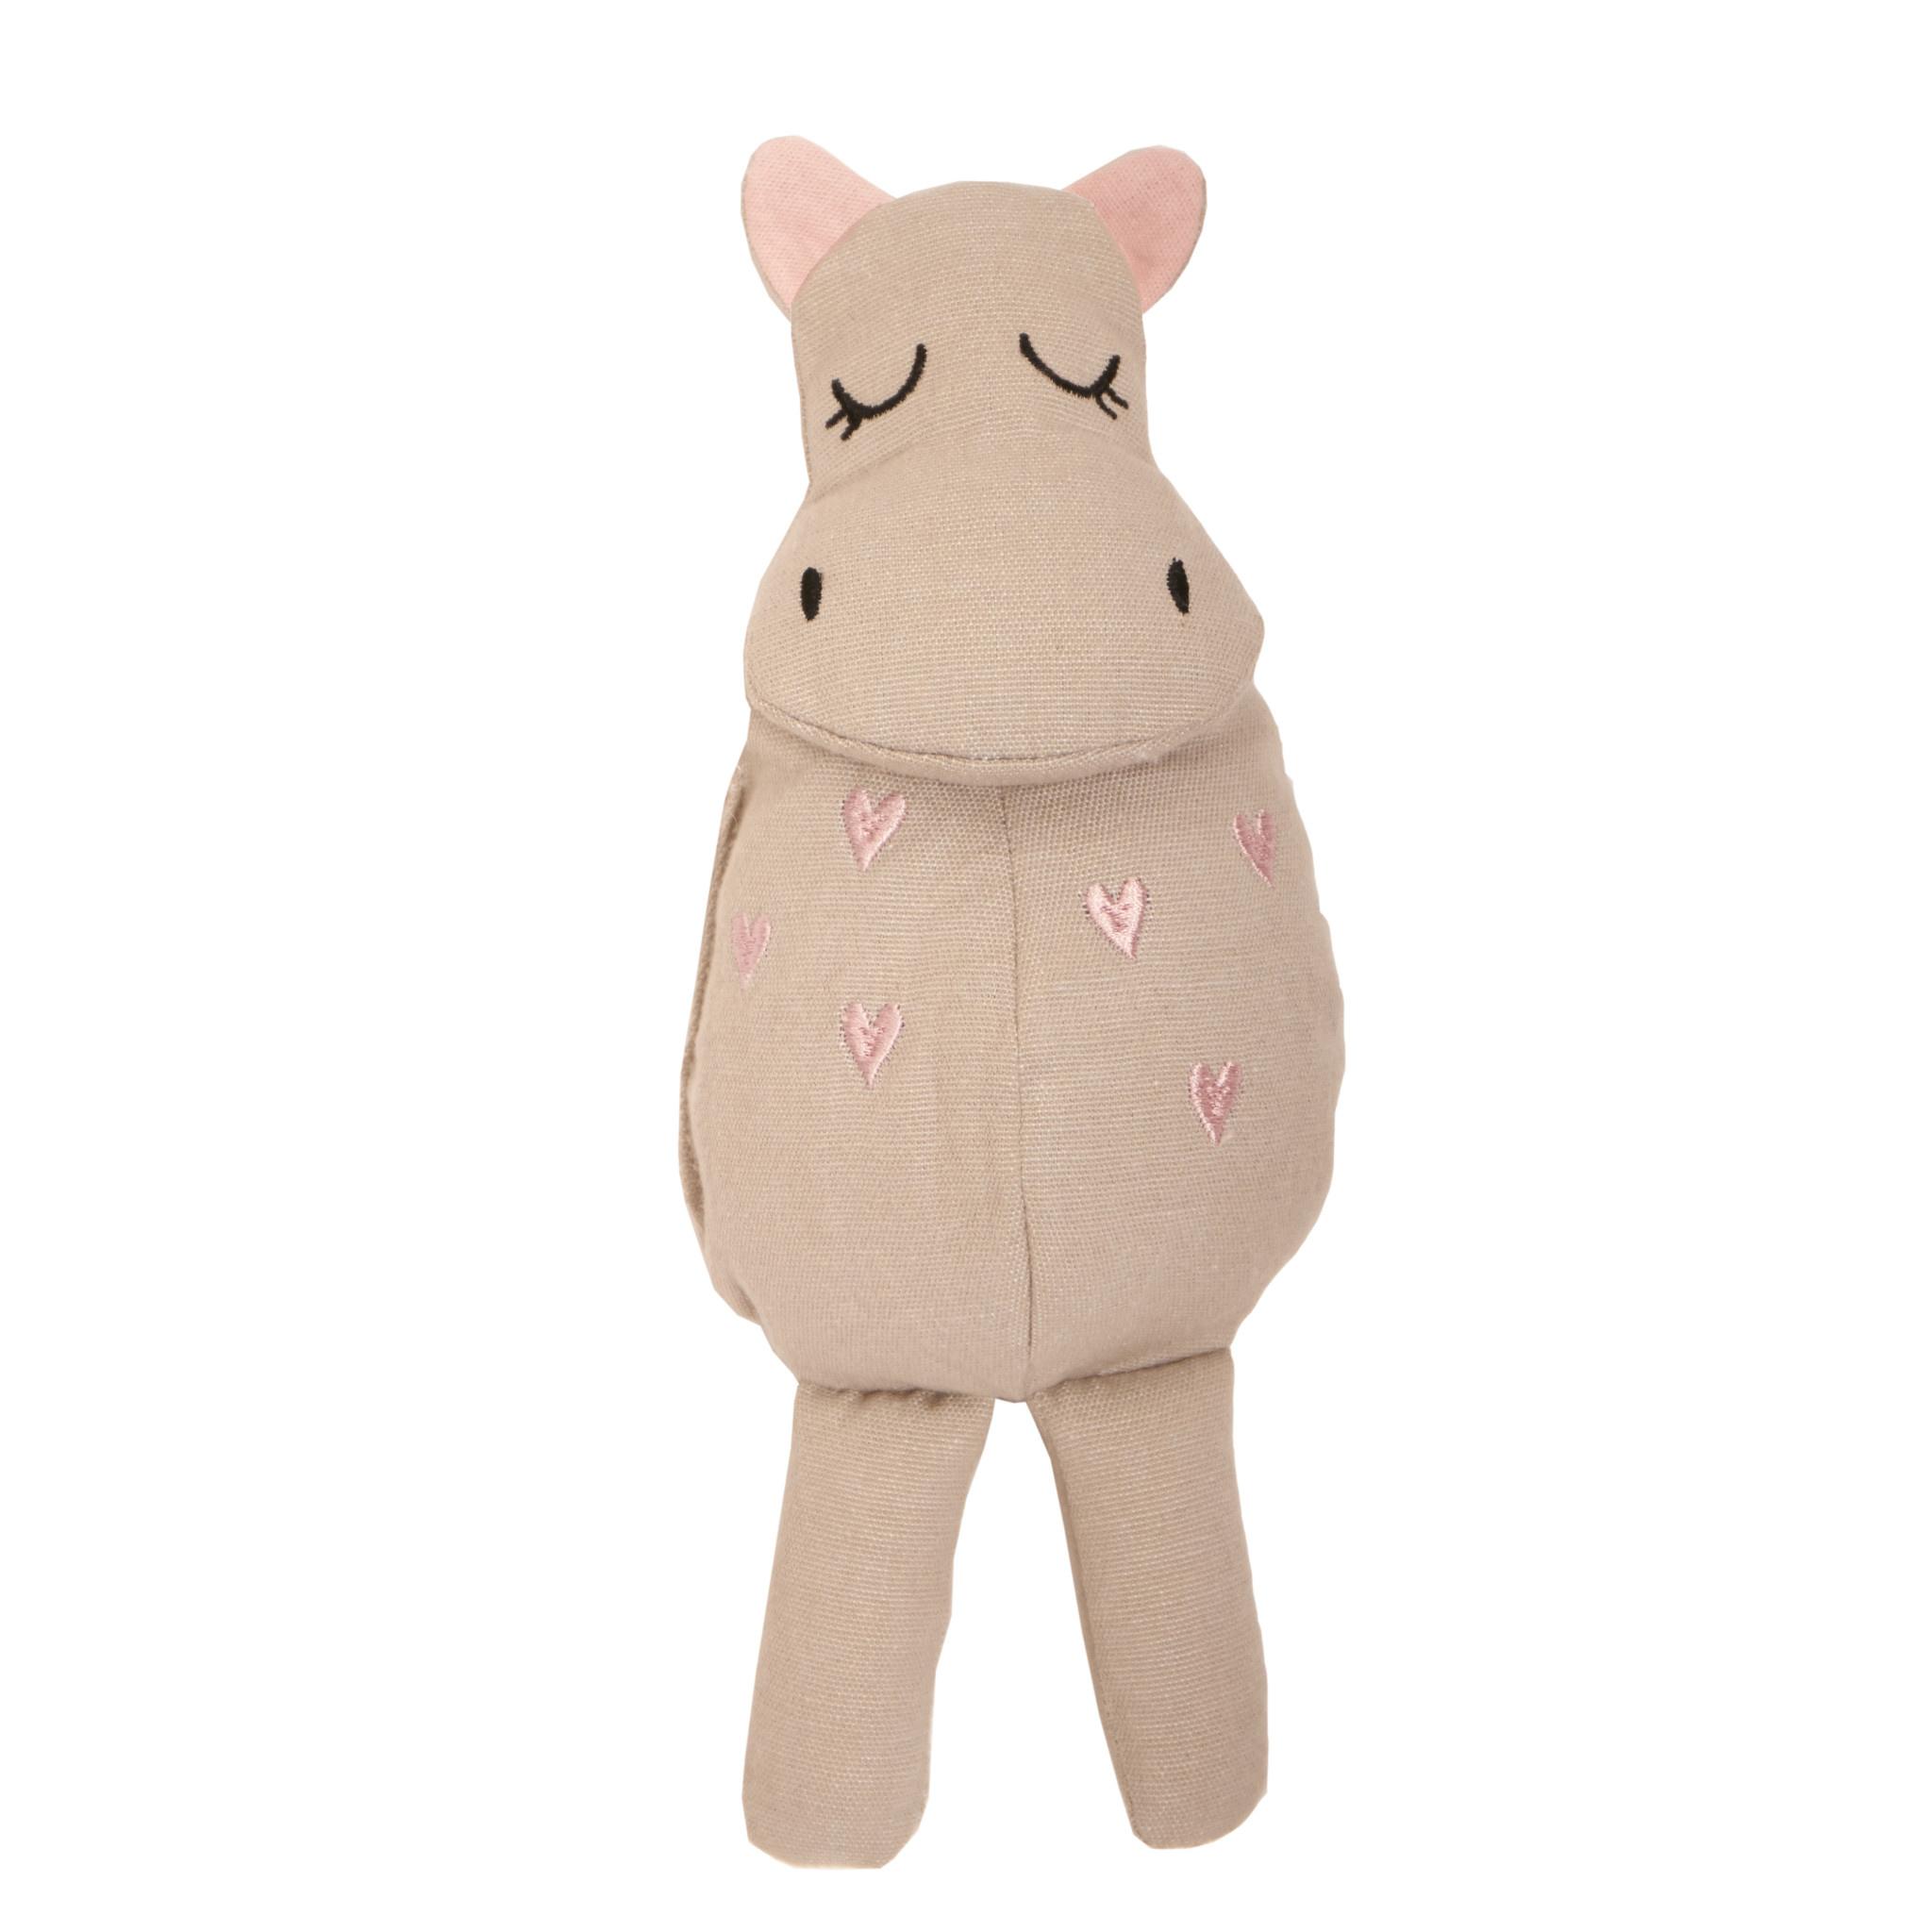 Roommate Hippo rag doll